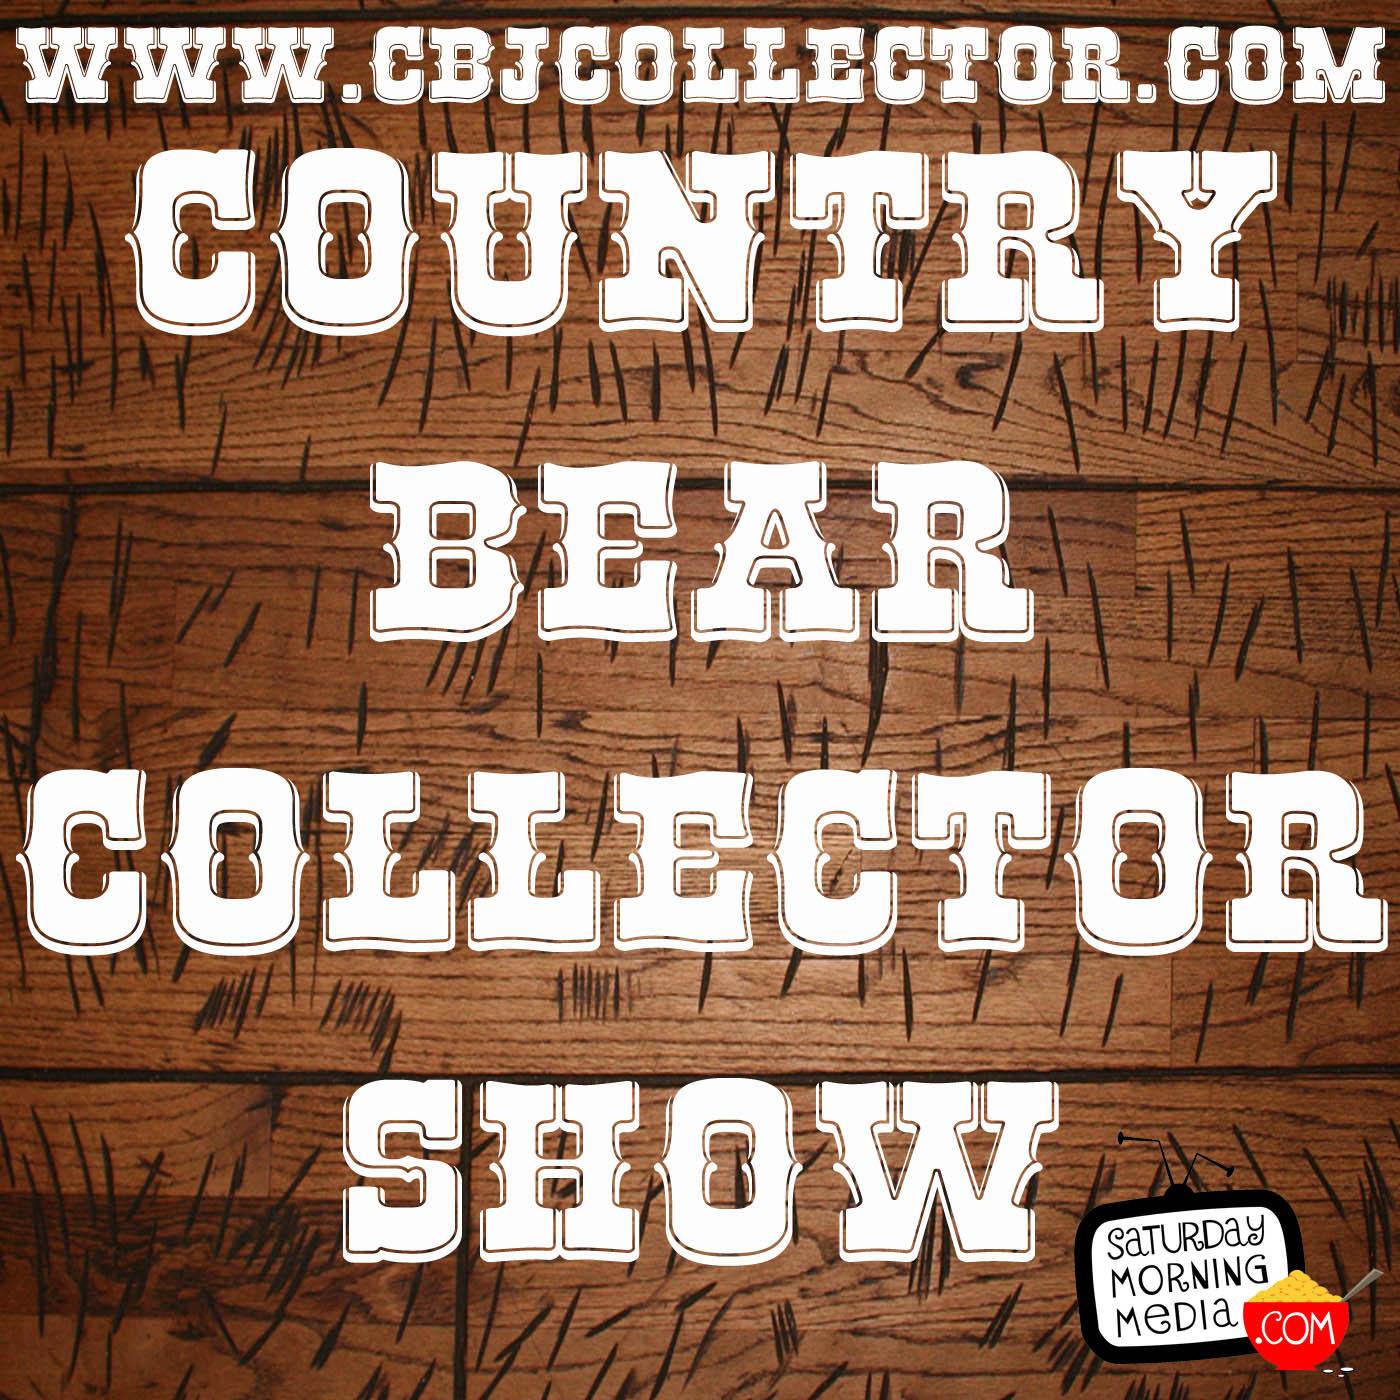 Artwork for 2017 Disney Fantasyland Football Buff Sweatshirt - Country Bear Collector Show #133